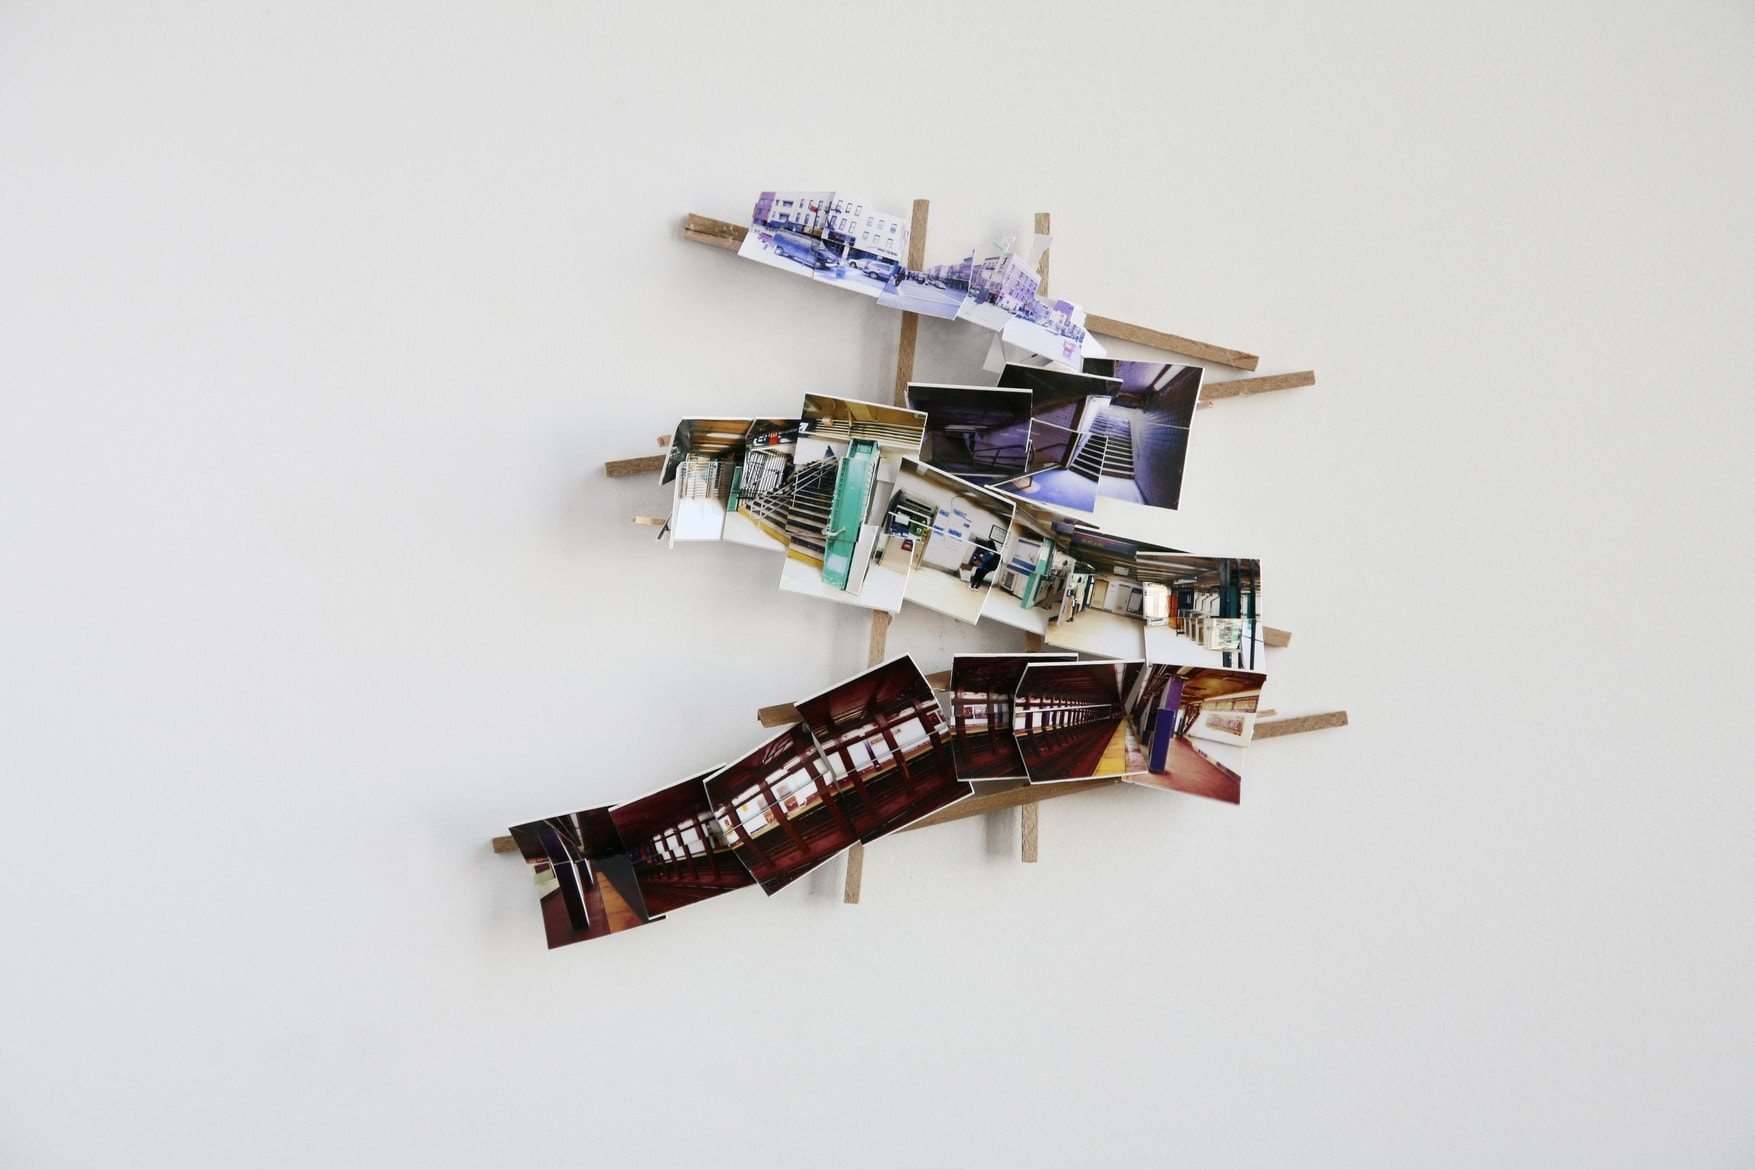 'Model 3', 2016, C-print, wood, museum board, 25 x 25 x 5 cm